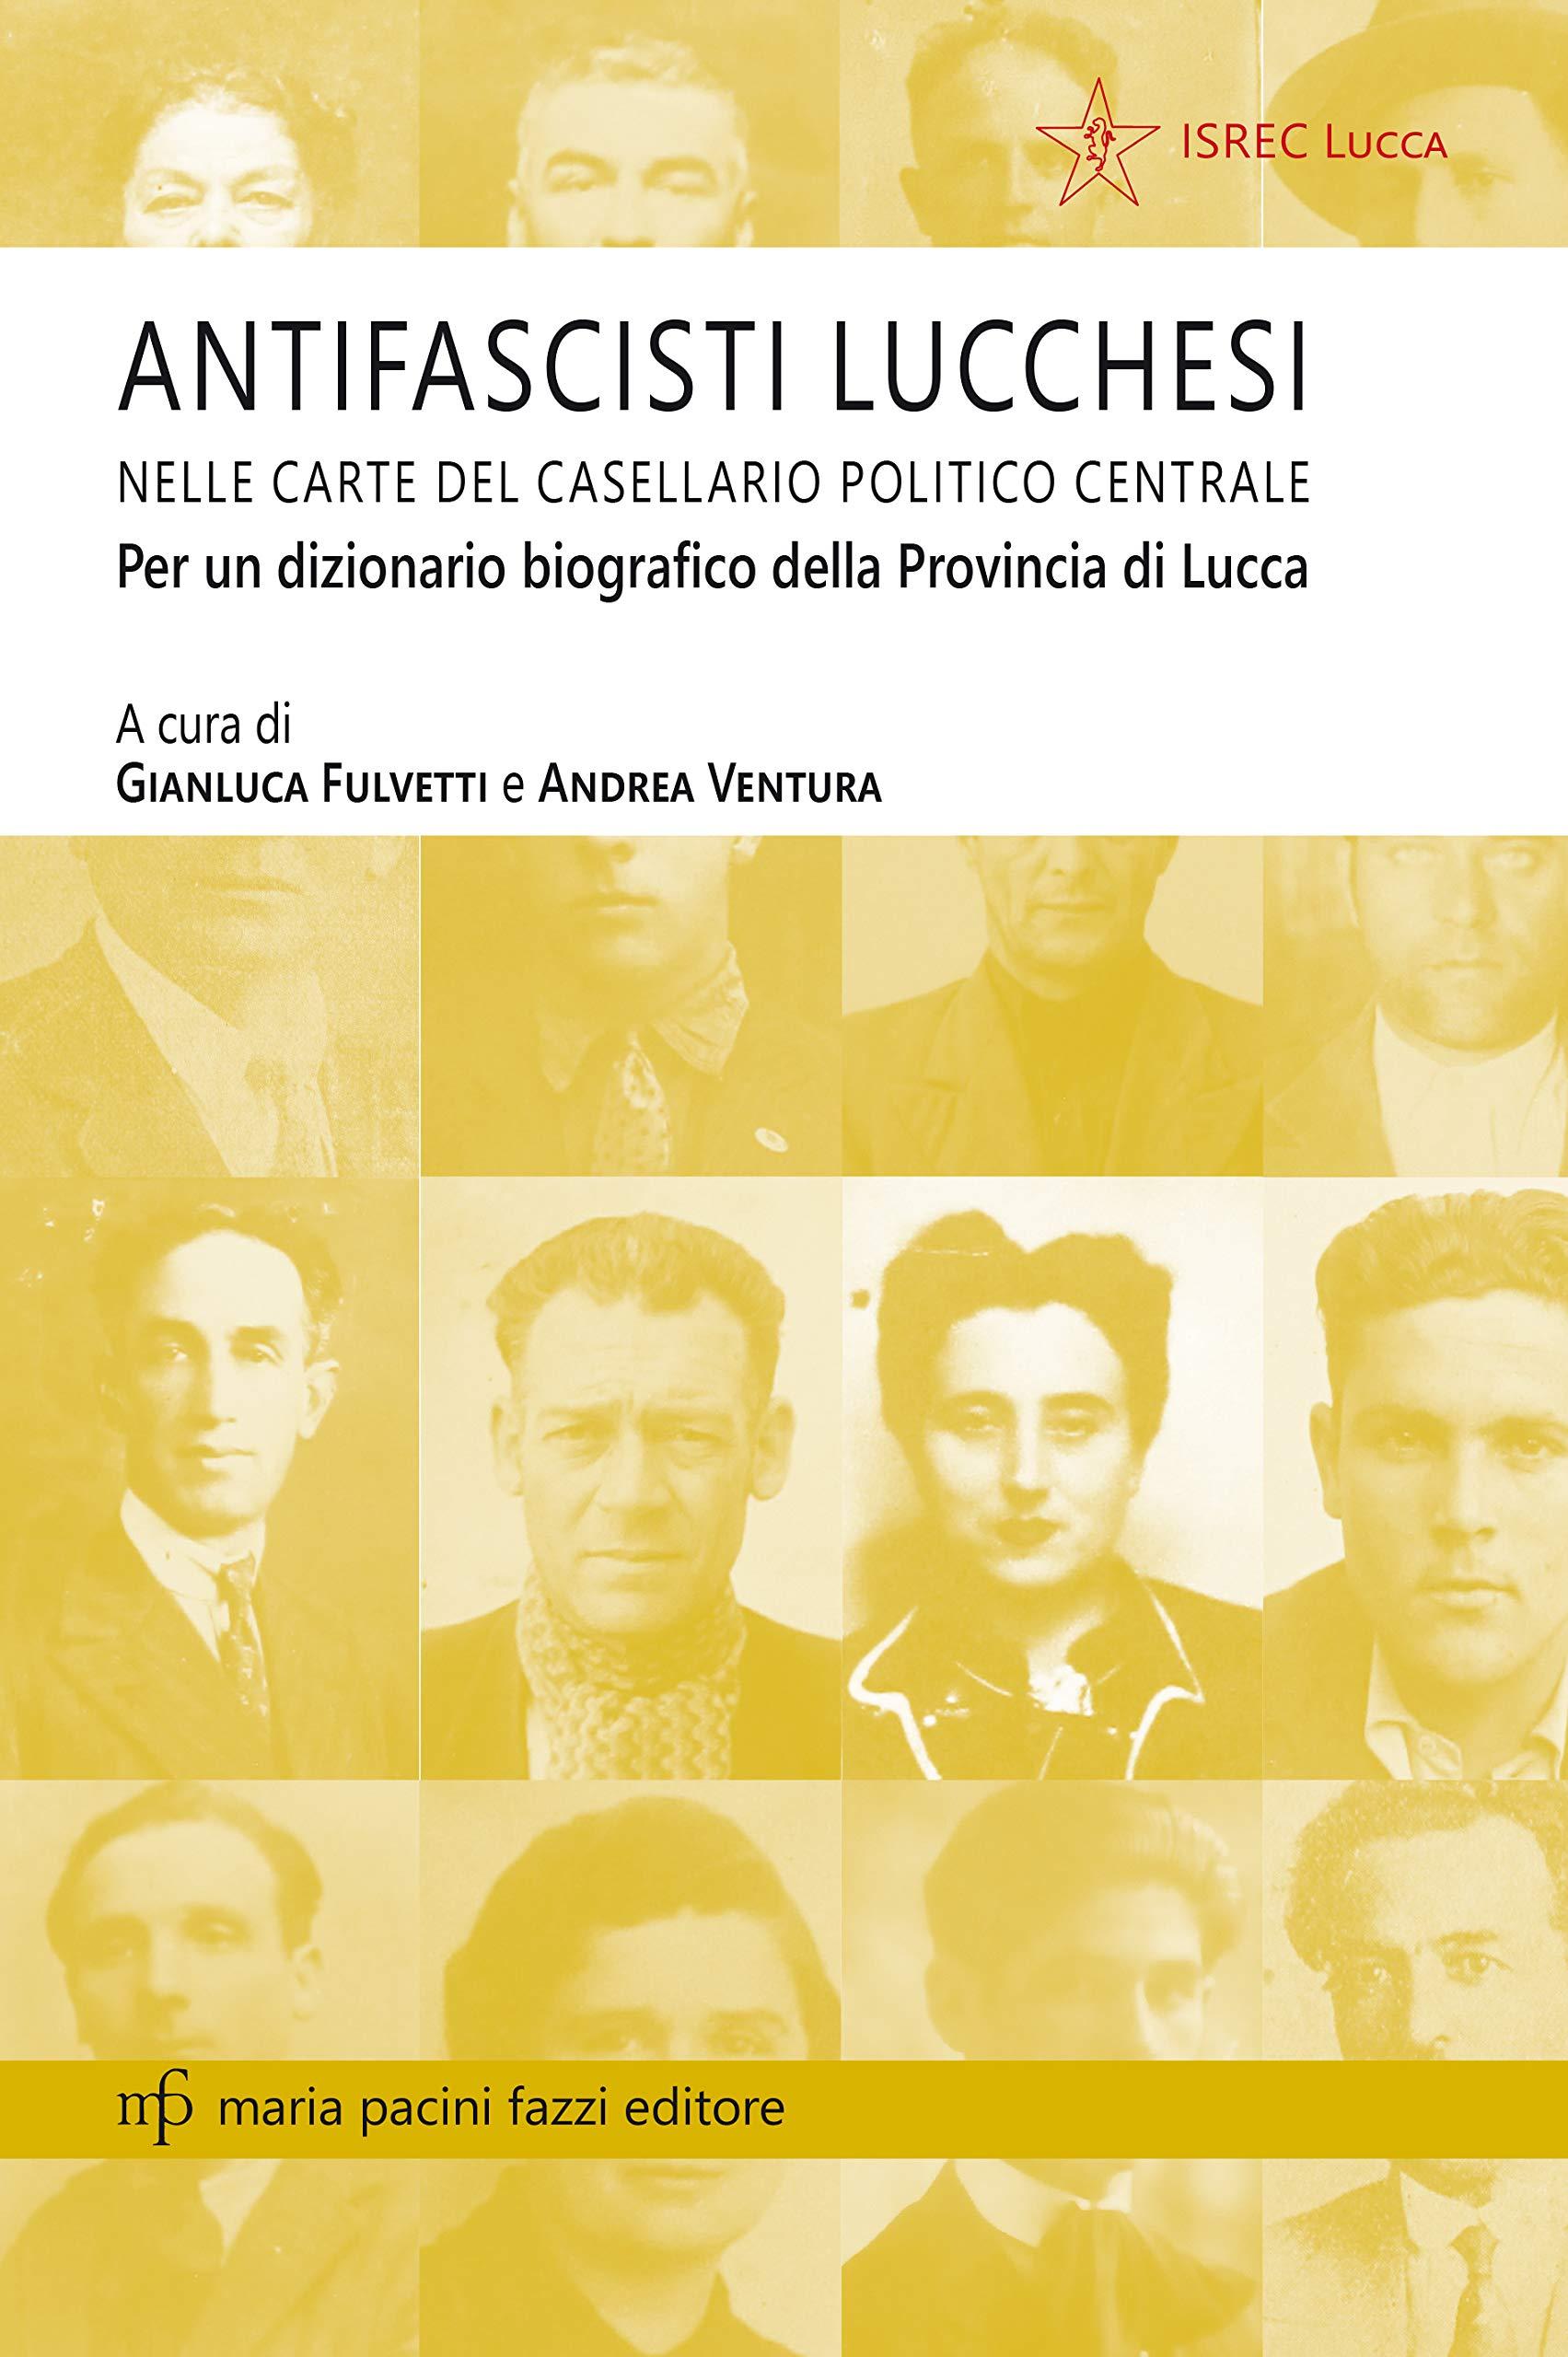 antifascisti lucchesi_fulvetti_ventura_ISRECLU